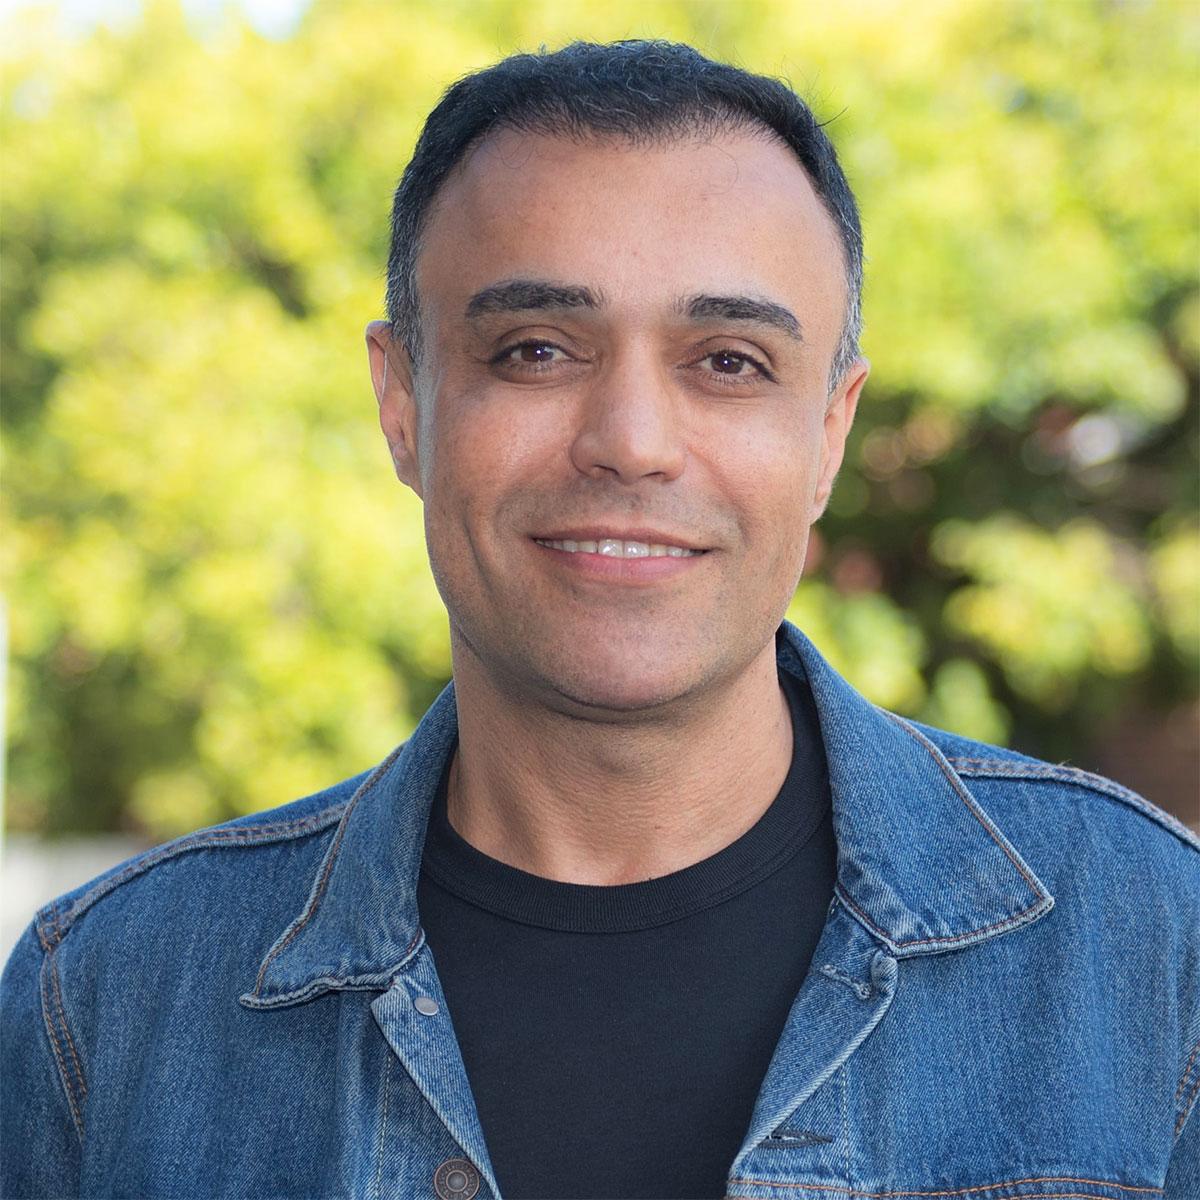 Shahram-Sadeghi-Elinay-Cosmetic-Surgery